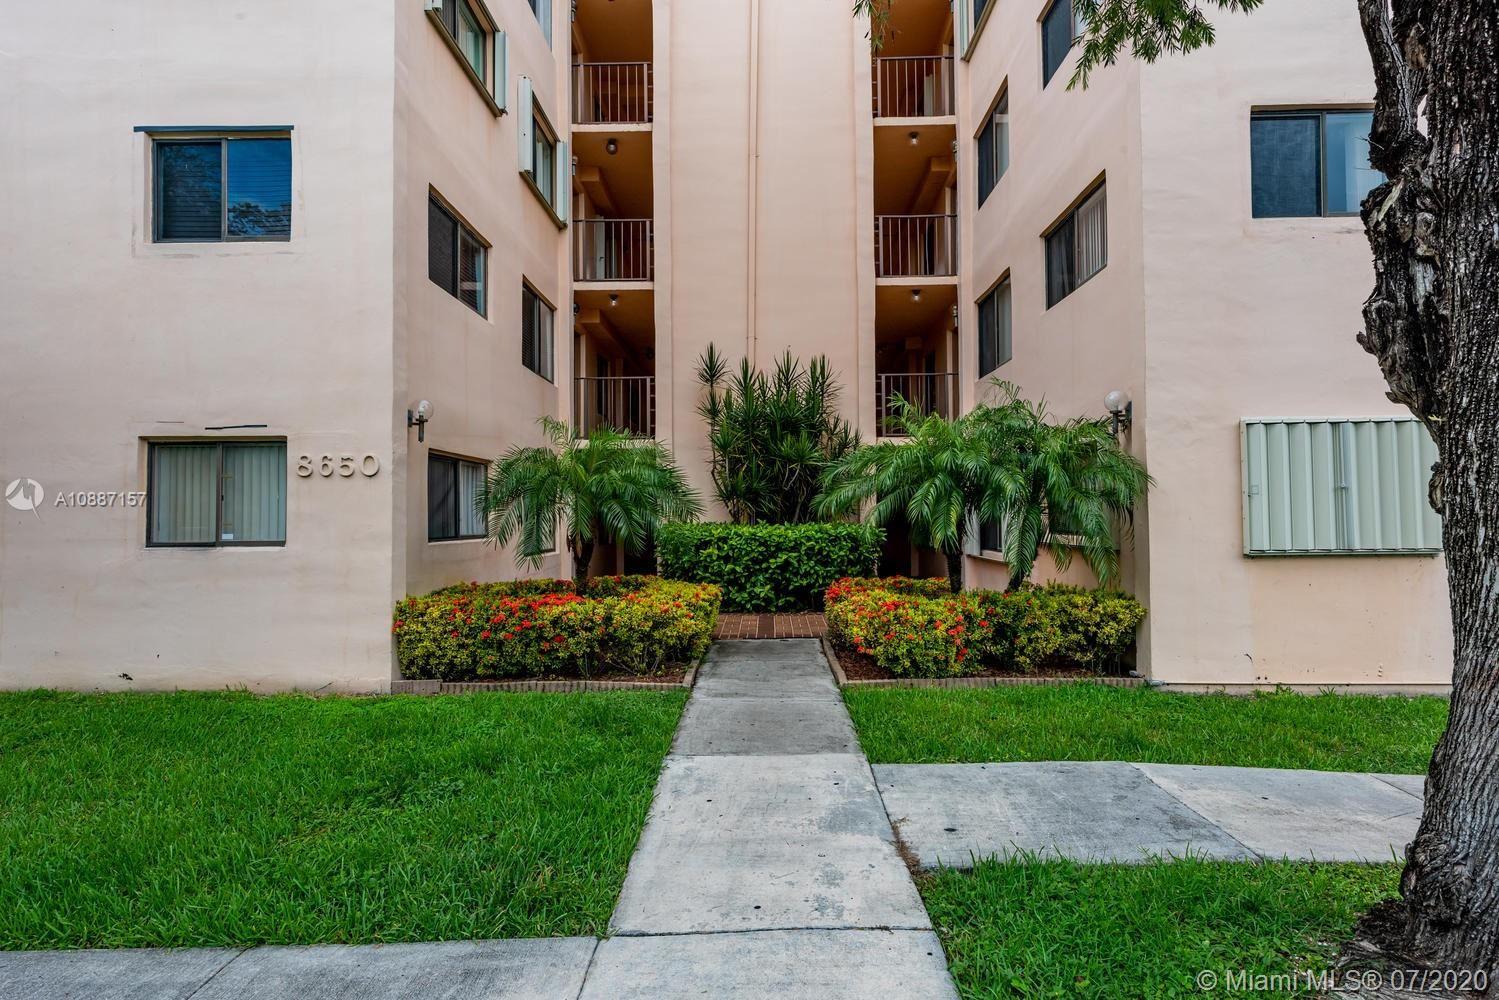 8650 SW 133rd Ave Rd #420, Miami, FL 33183 - #: A10887157